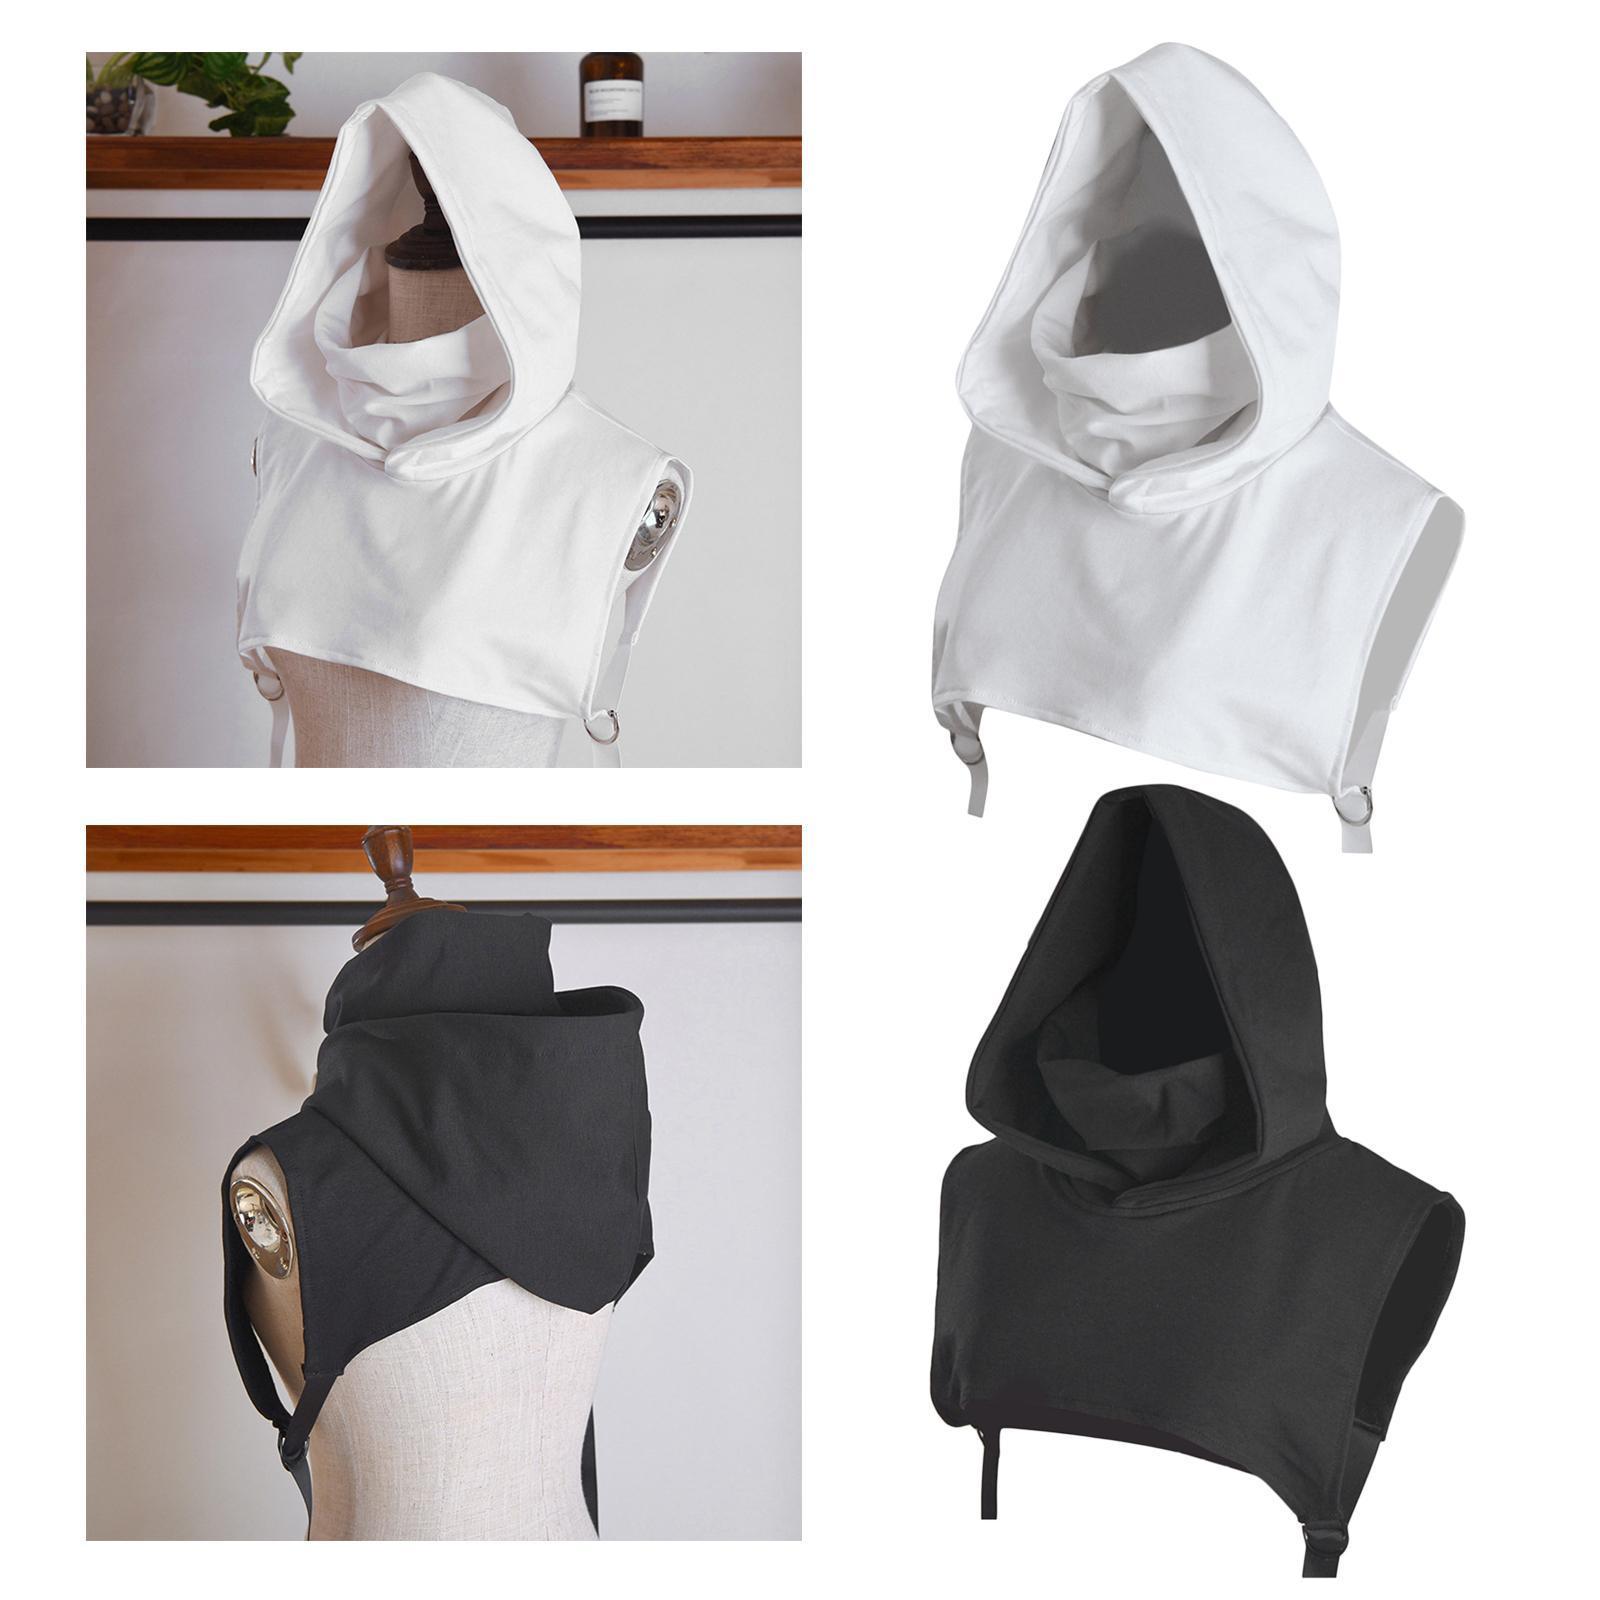 Stylish False Collar Hood Cotton Unisex Sweater Jacket Hat Detachable Winter